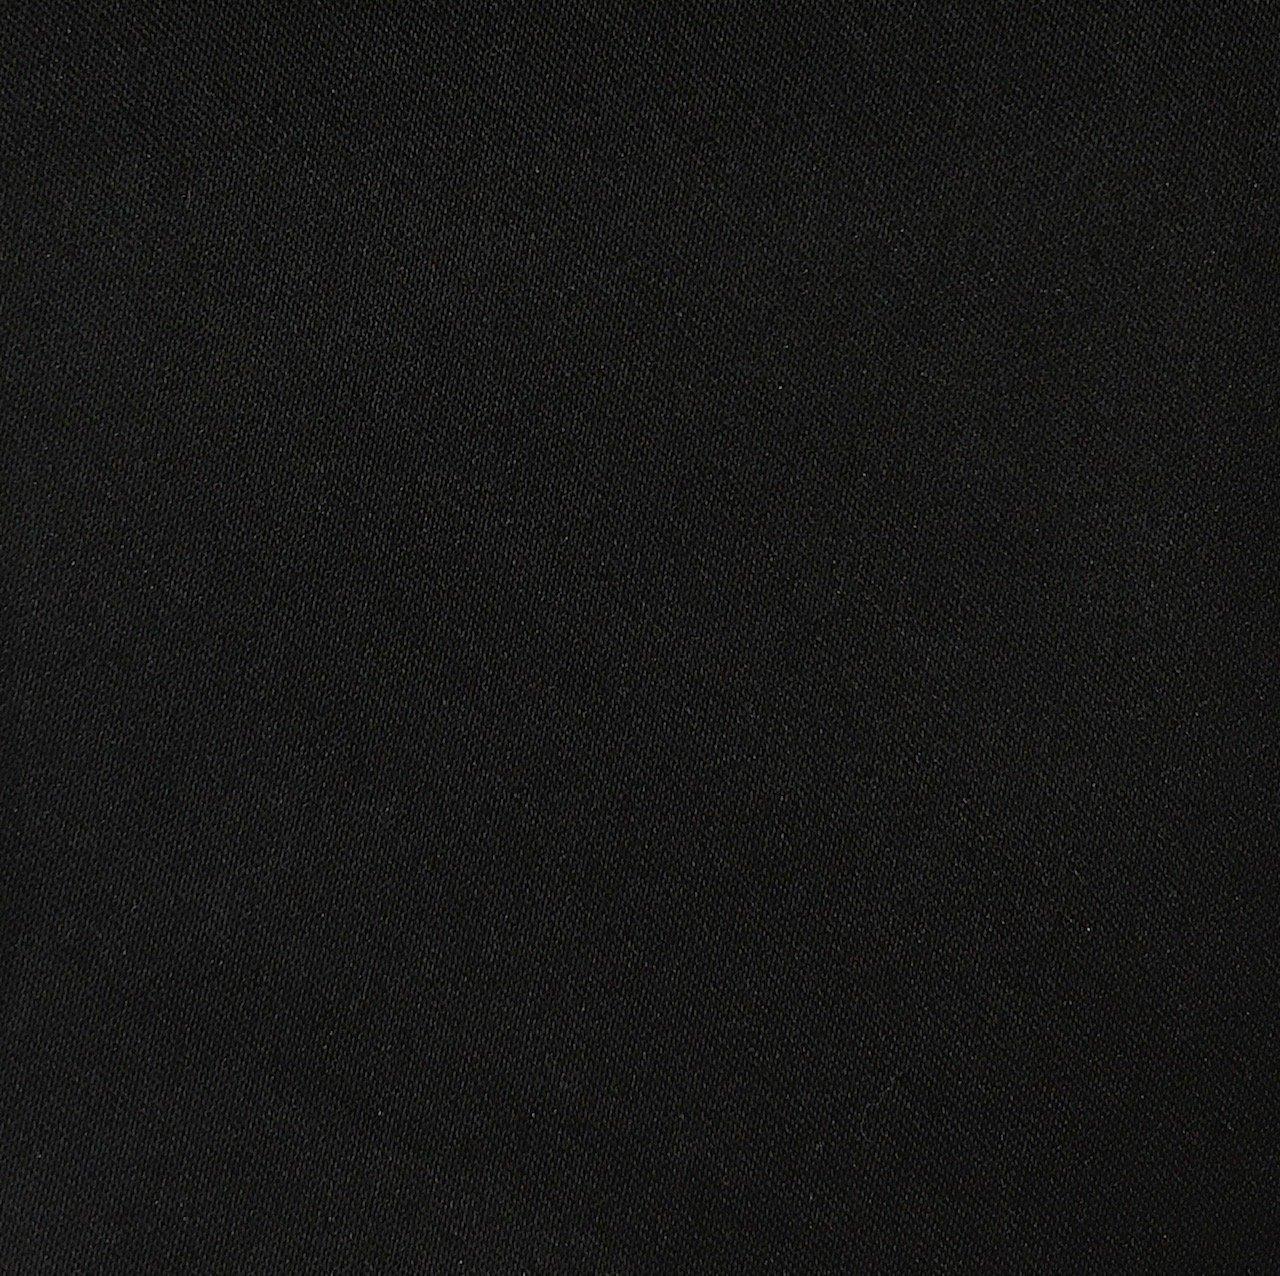 Microfiber - Black